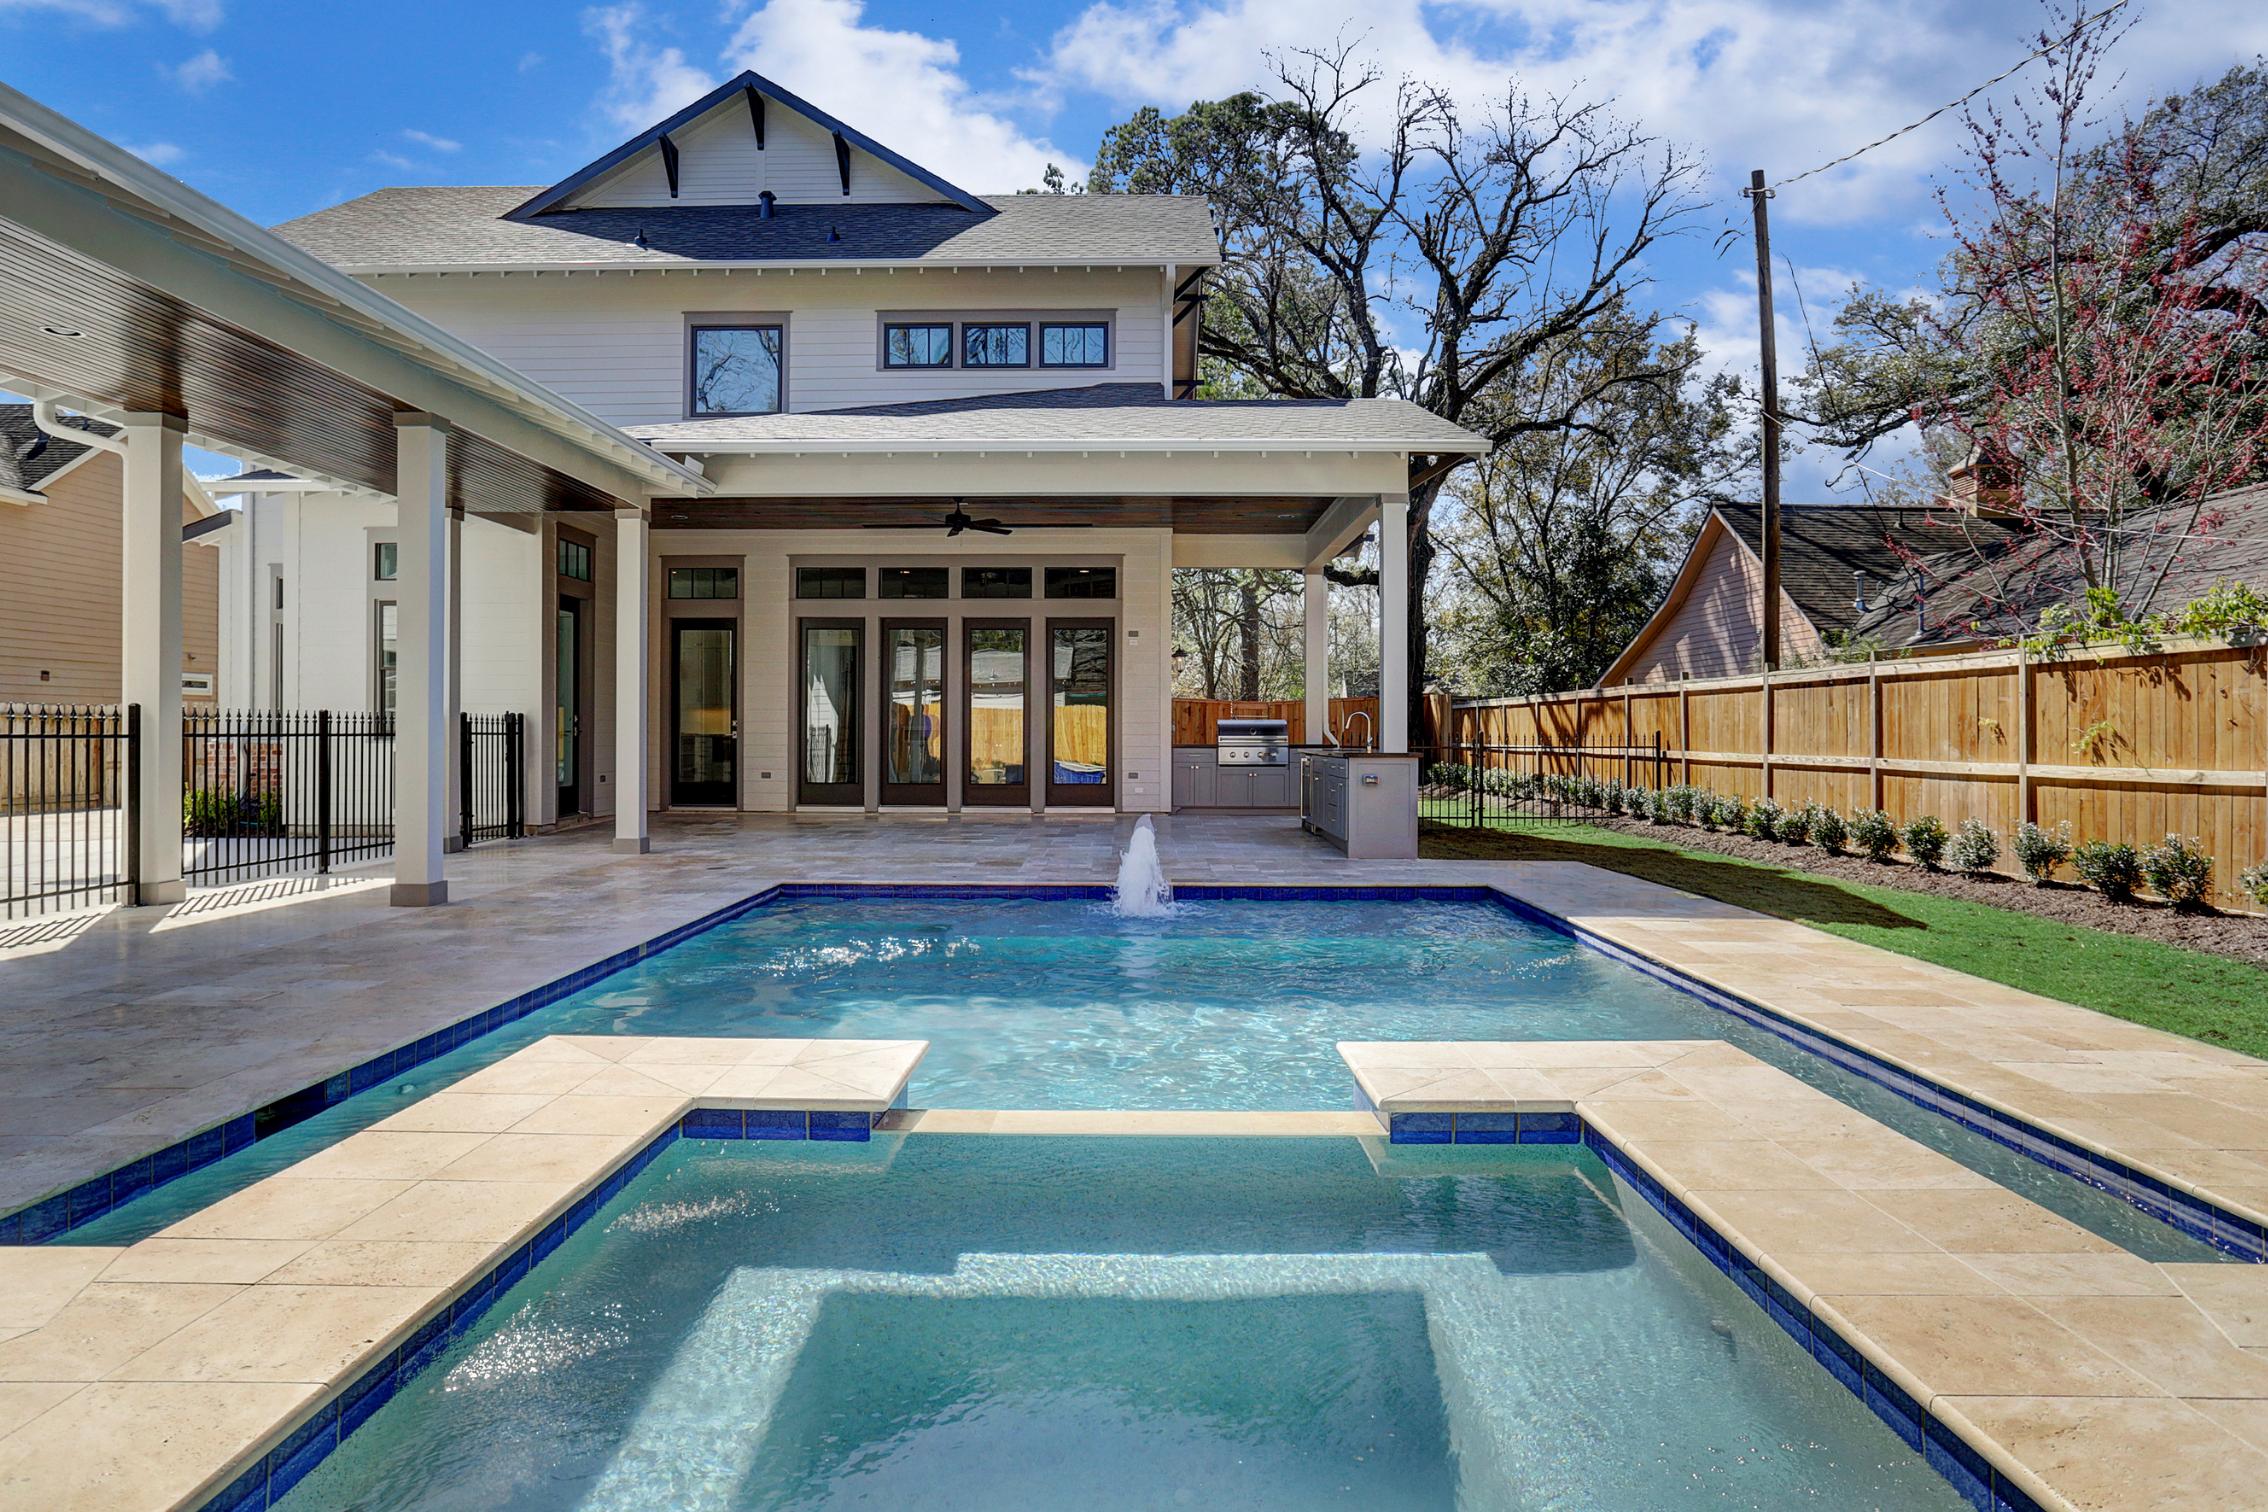 Backyard Pool in Houston Home